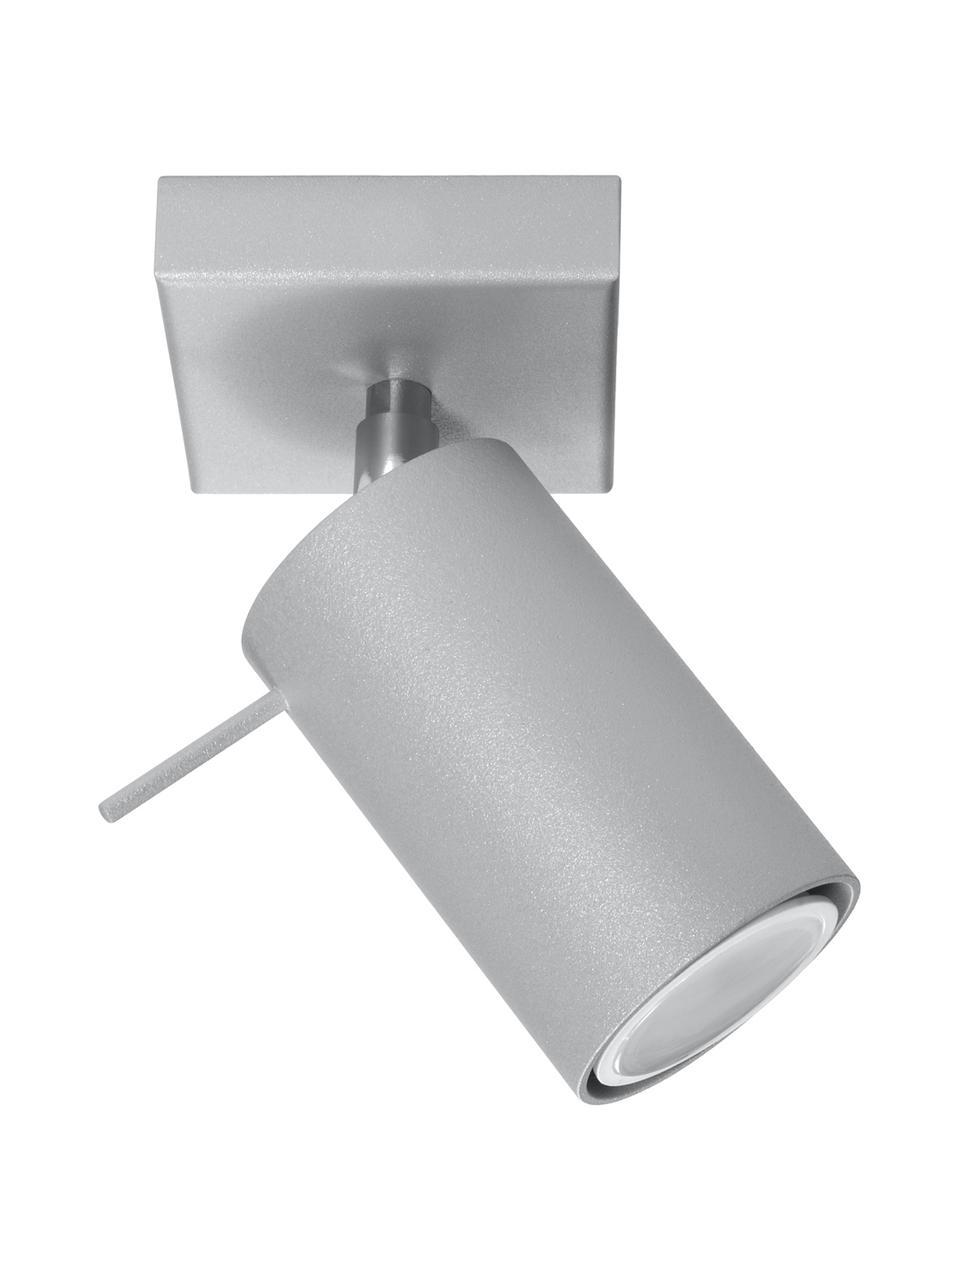 Faretto da soffitto grigio Etna, Paralume: acciaio verniciato, Grigio, Larg. 8 x Alt. 15 cm